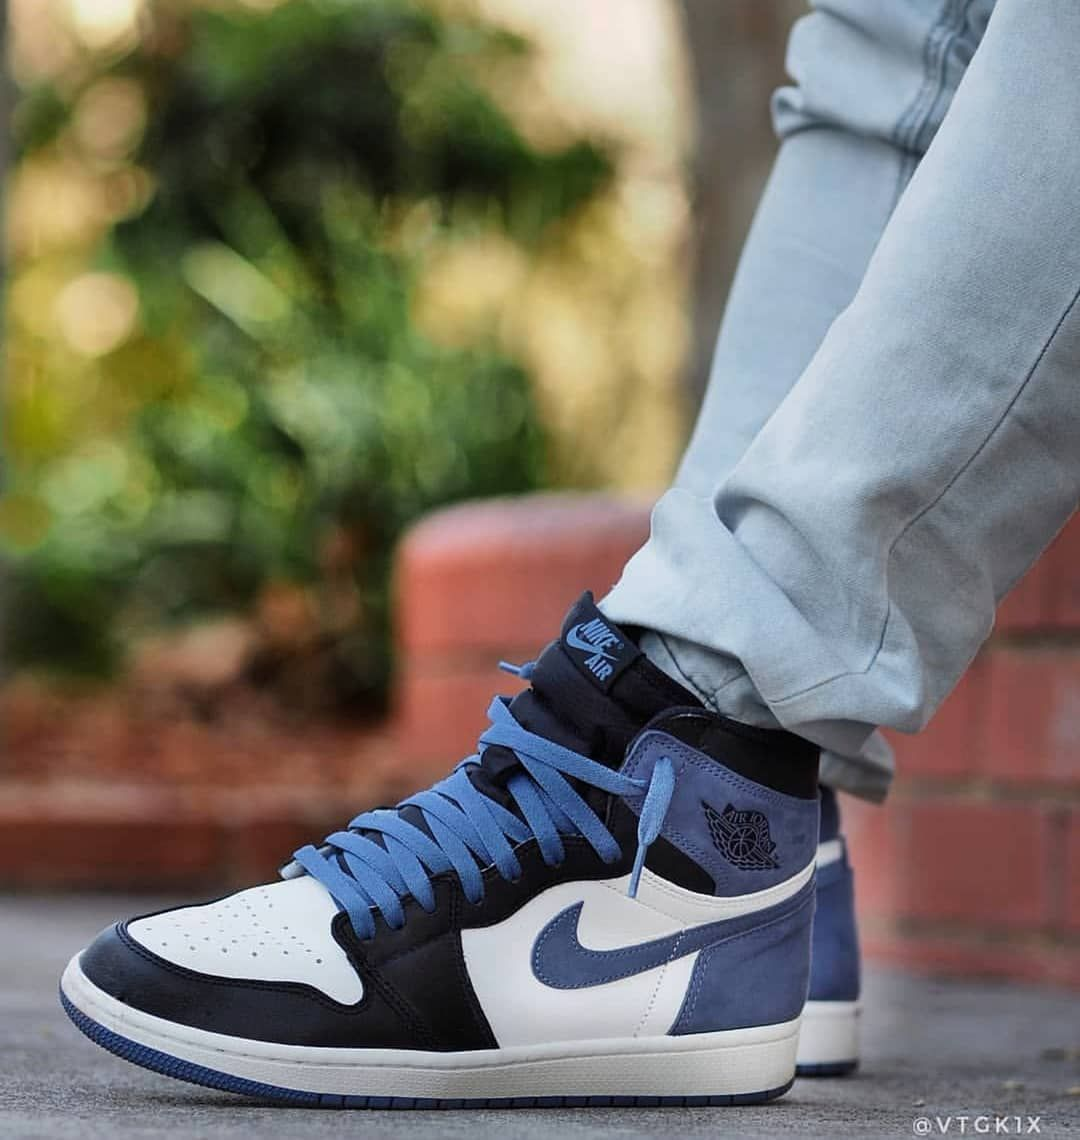 Blue Moon 1 S Vtgk1x Use Our H Sneakers Sneaker Bar Blue Moon